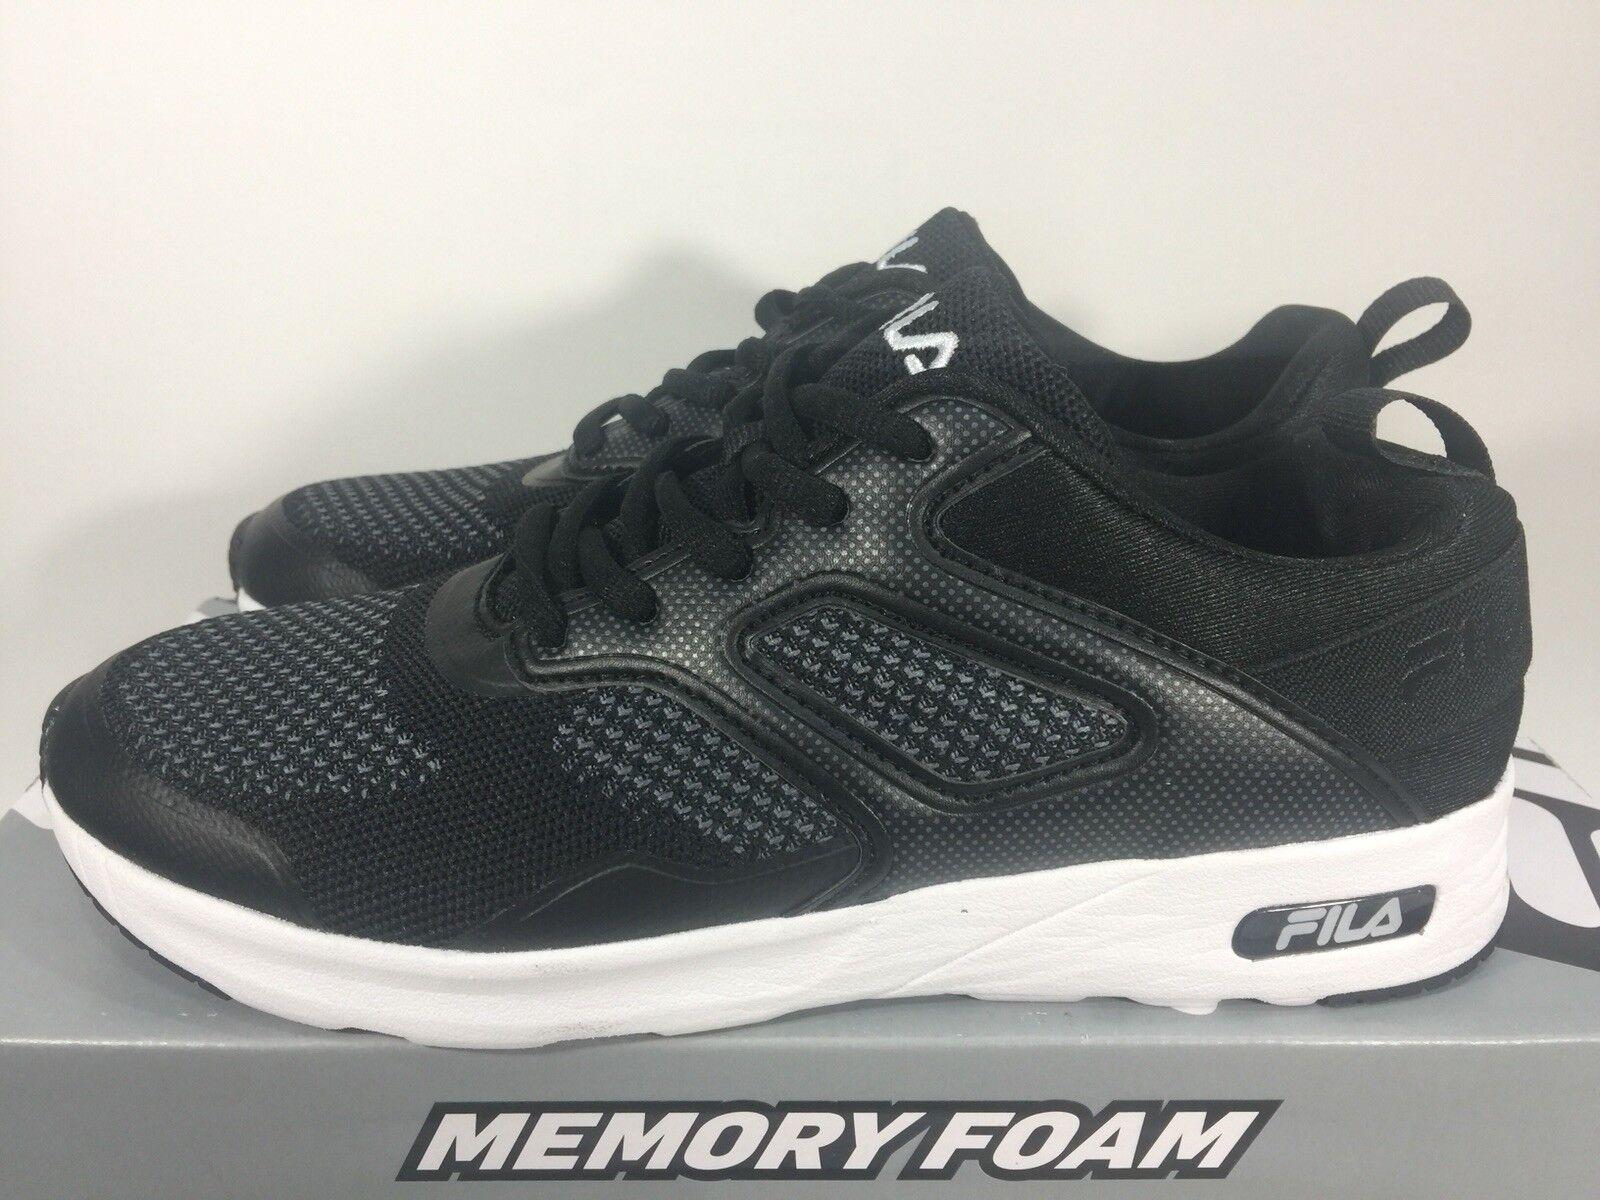 6c5f8a3d70754 FILA Frame V6 Memory Foam Sneakers Women's Shoes ~ Black ~ Various Sizes !!